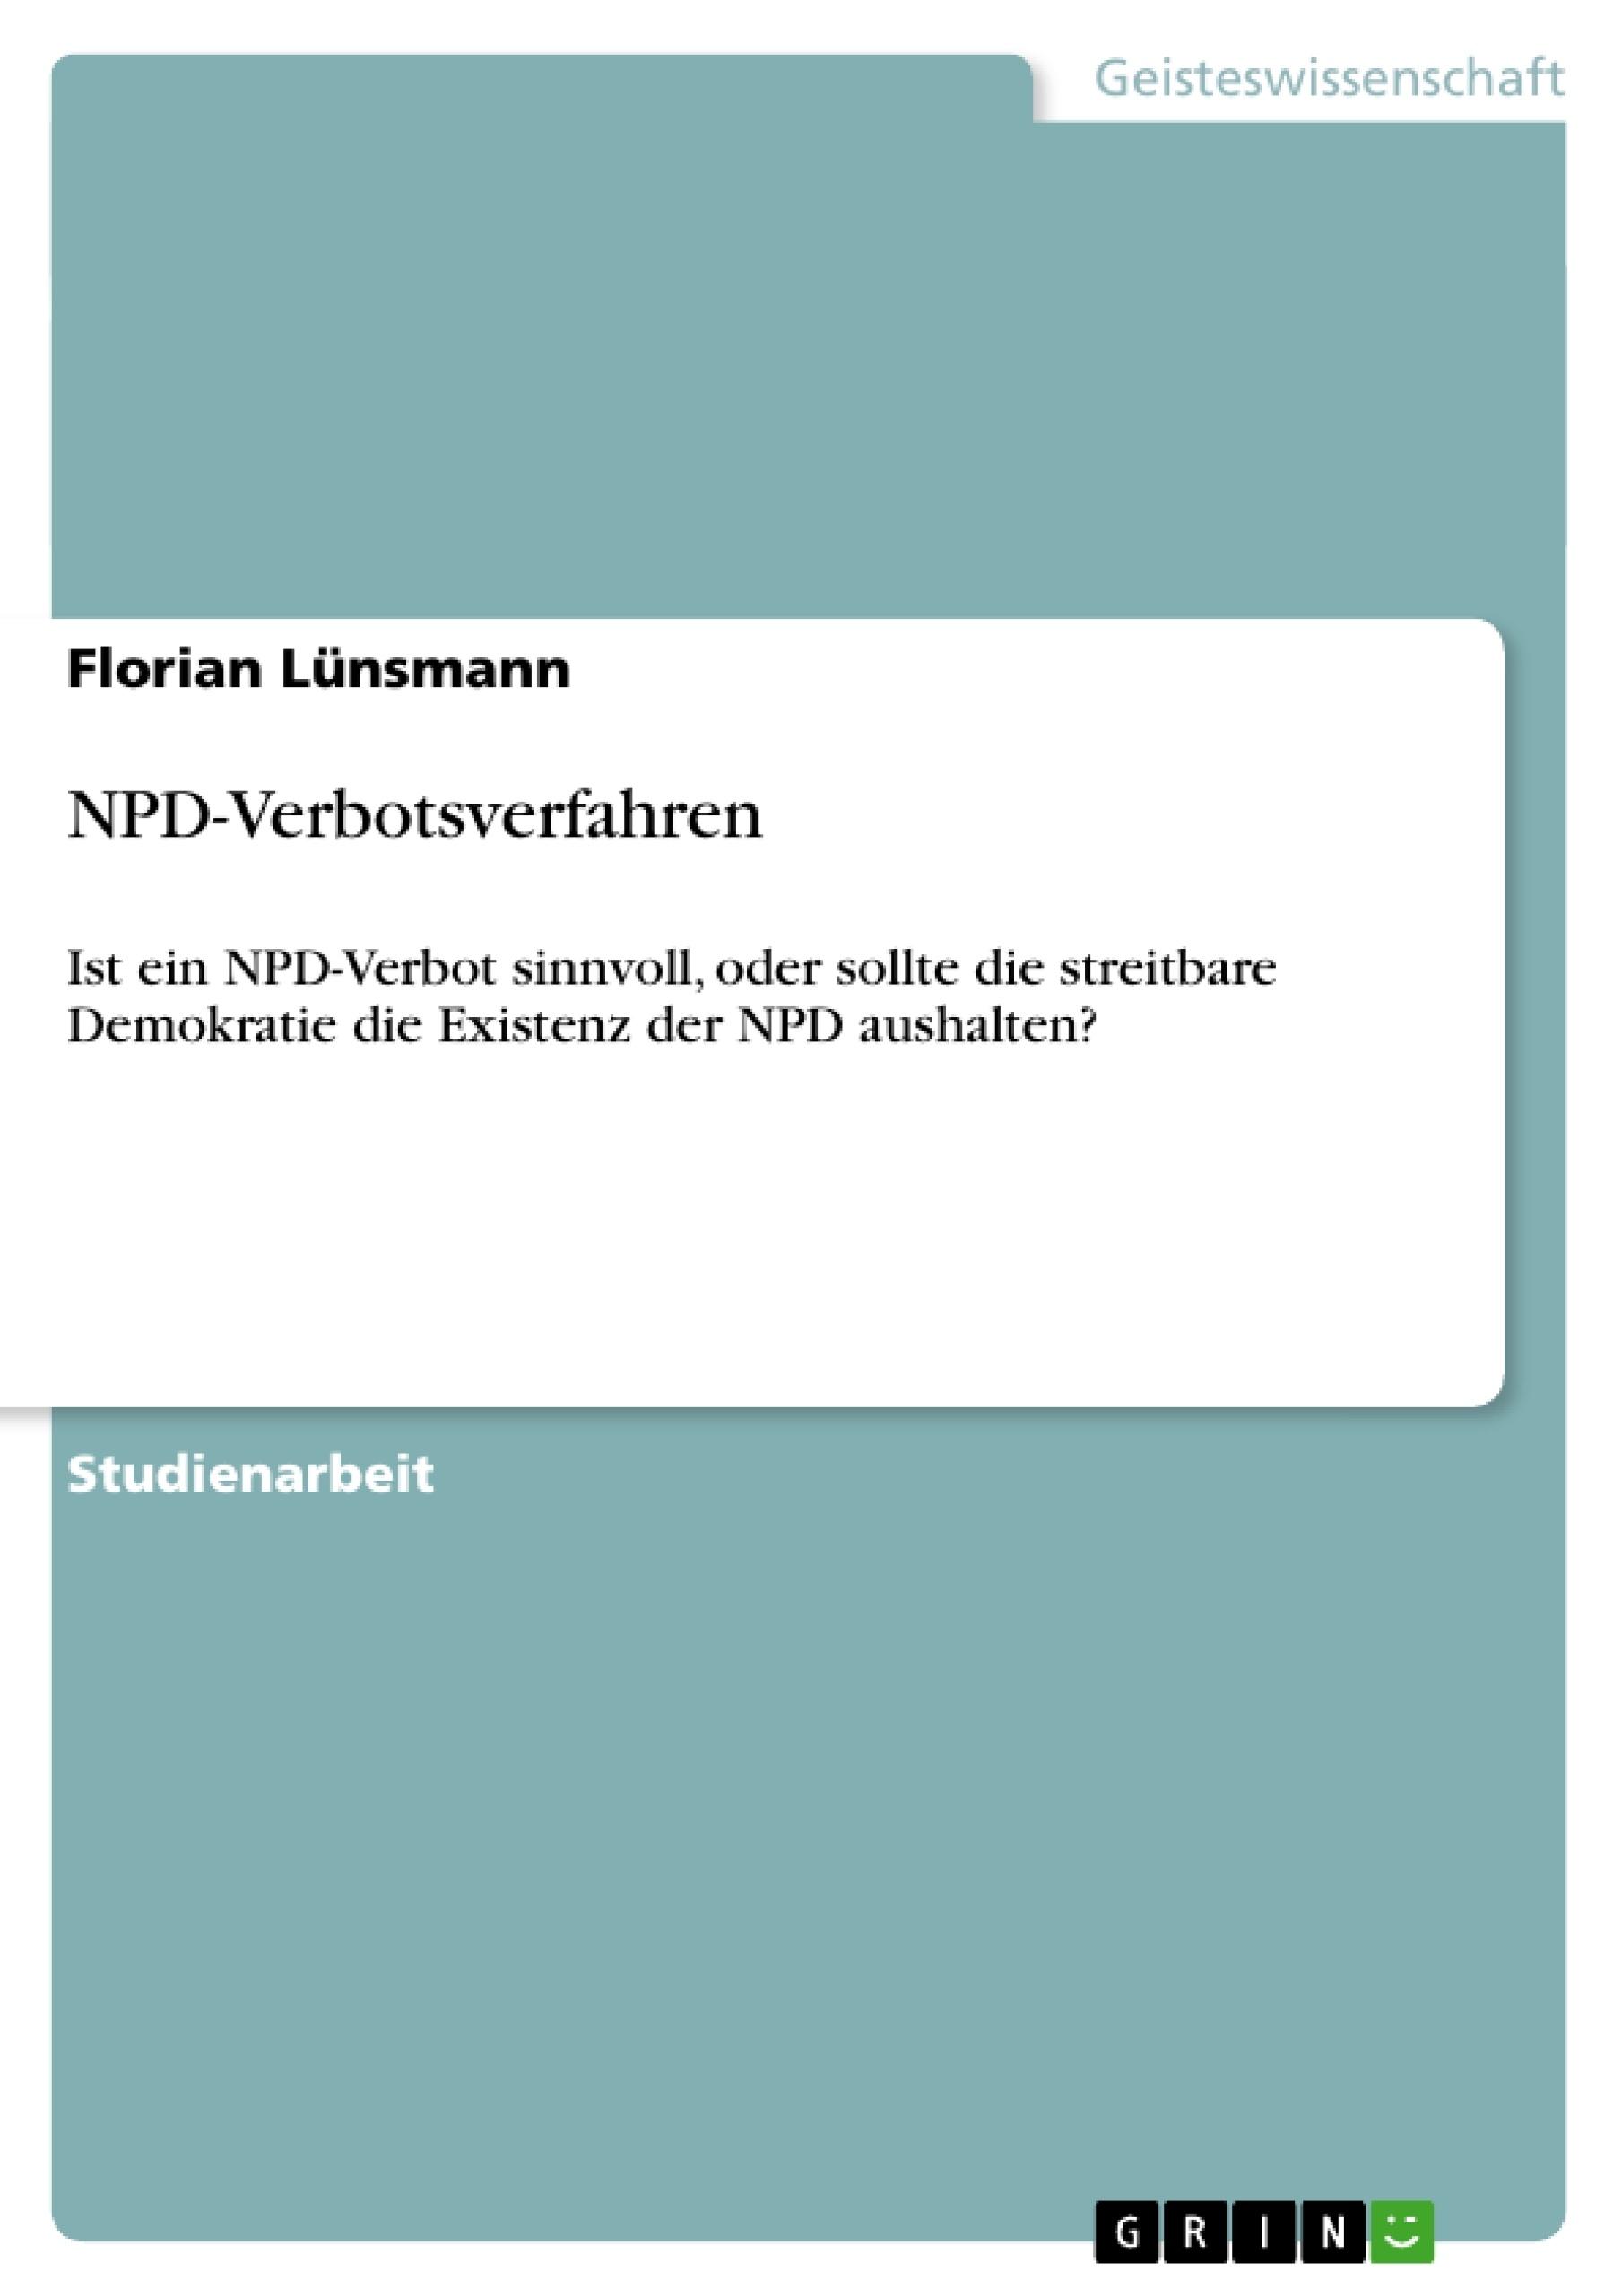 Titel: NPD-Verbotsverfahren